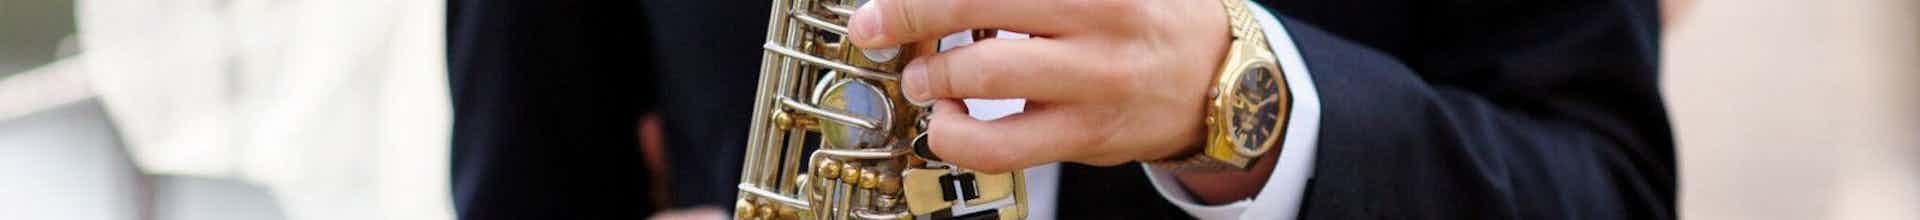 saxofoon saxofonisten saxofonis boeken